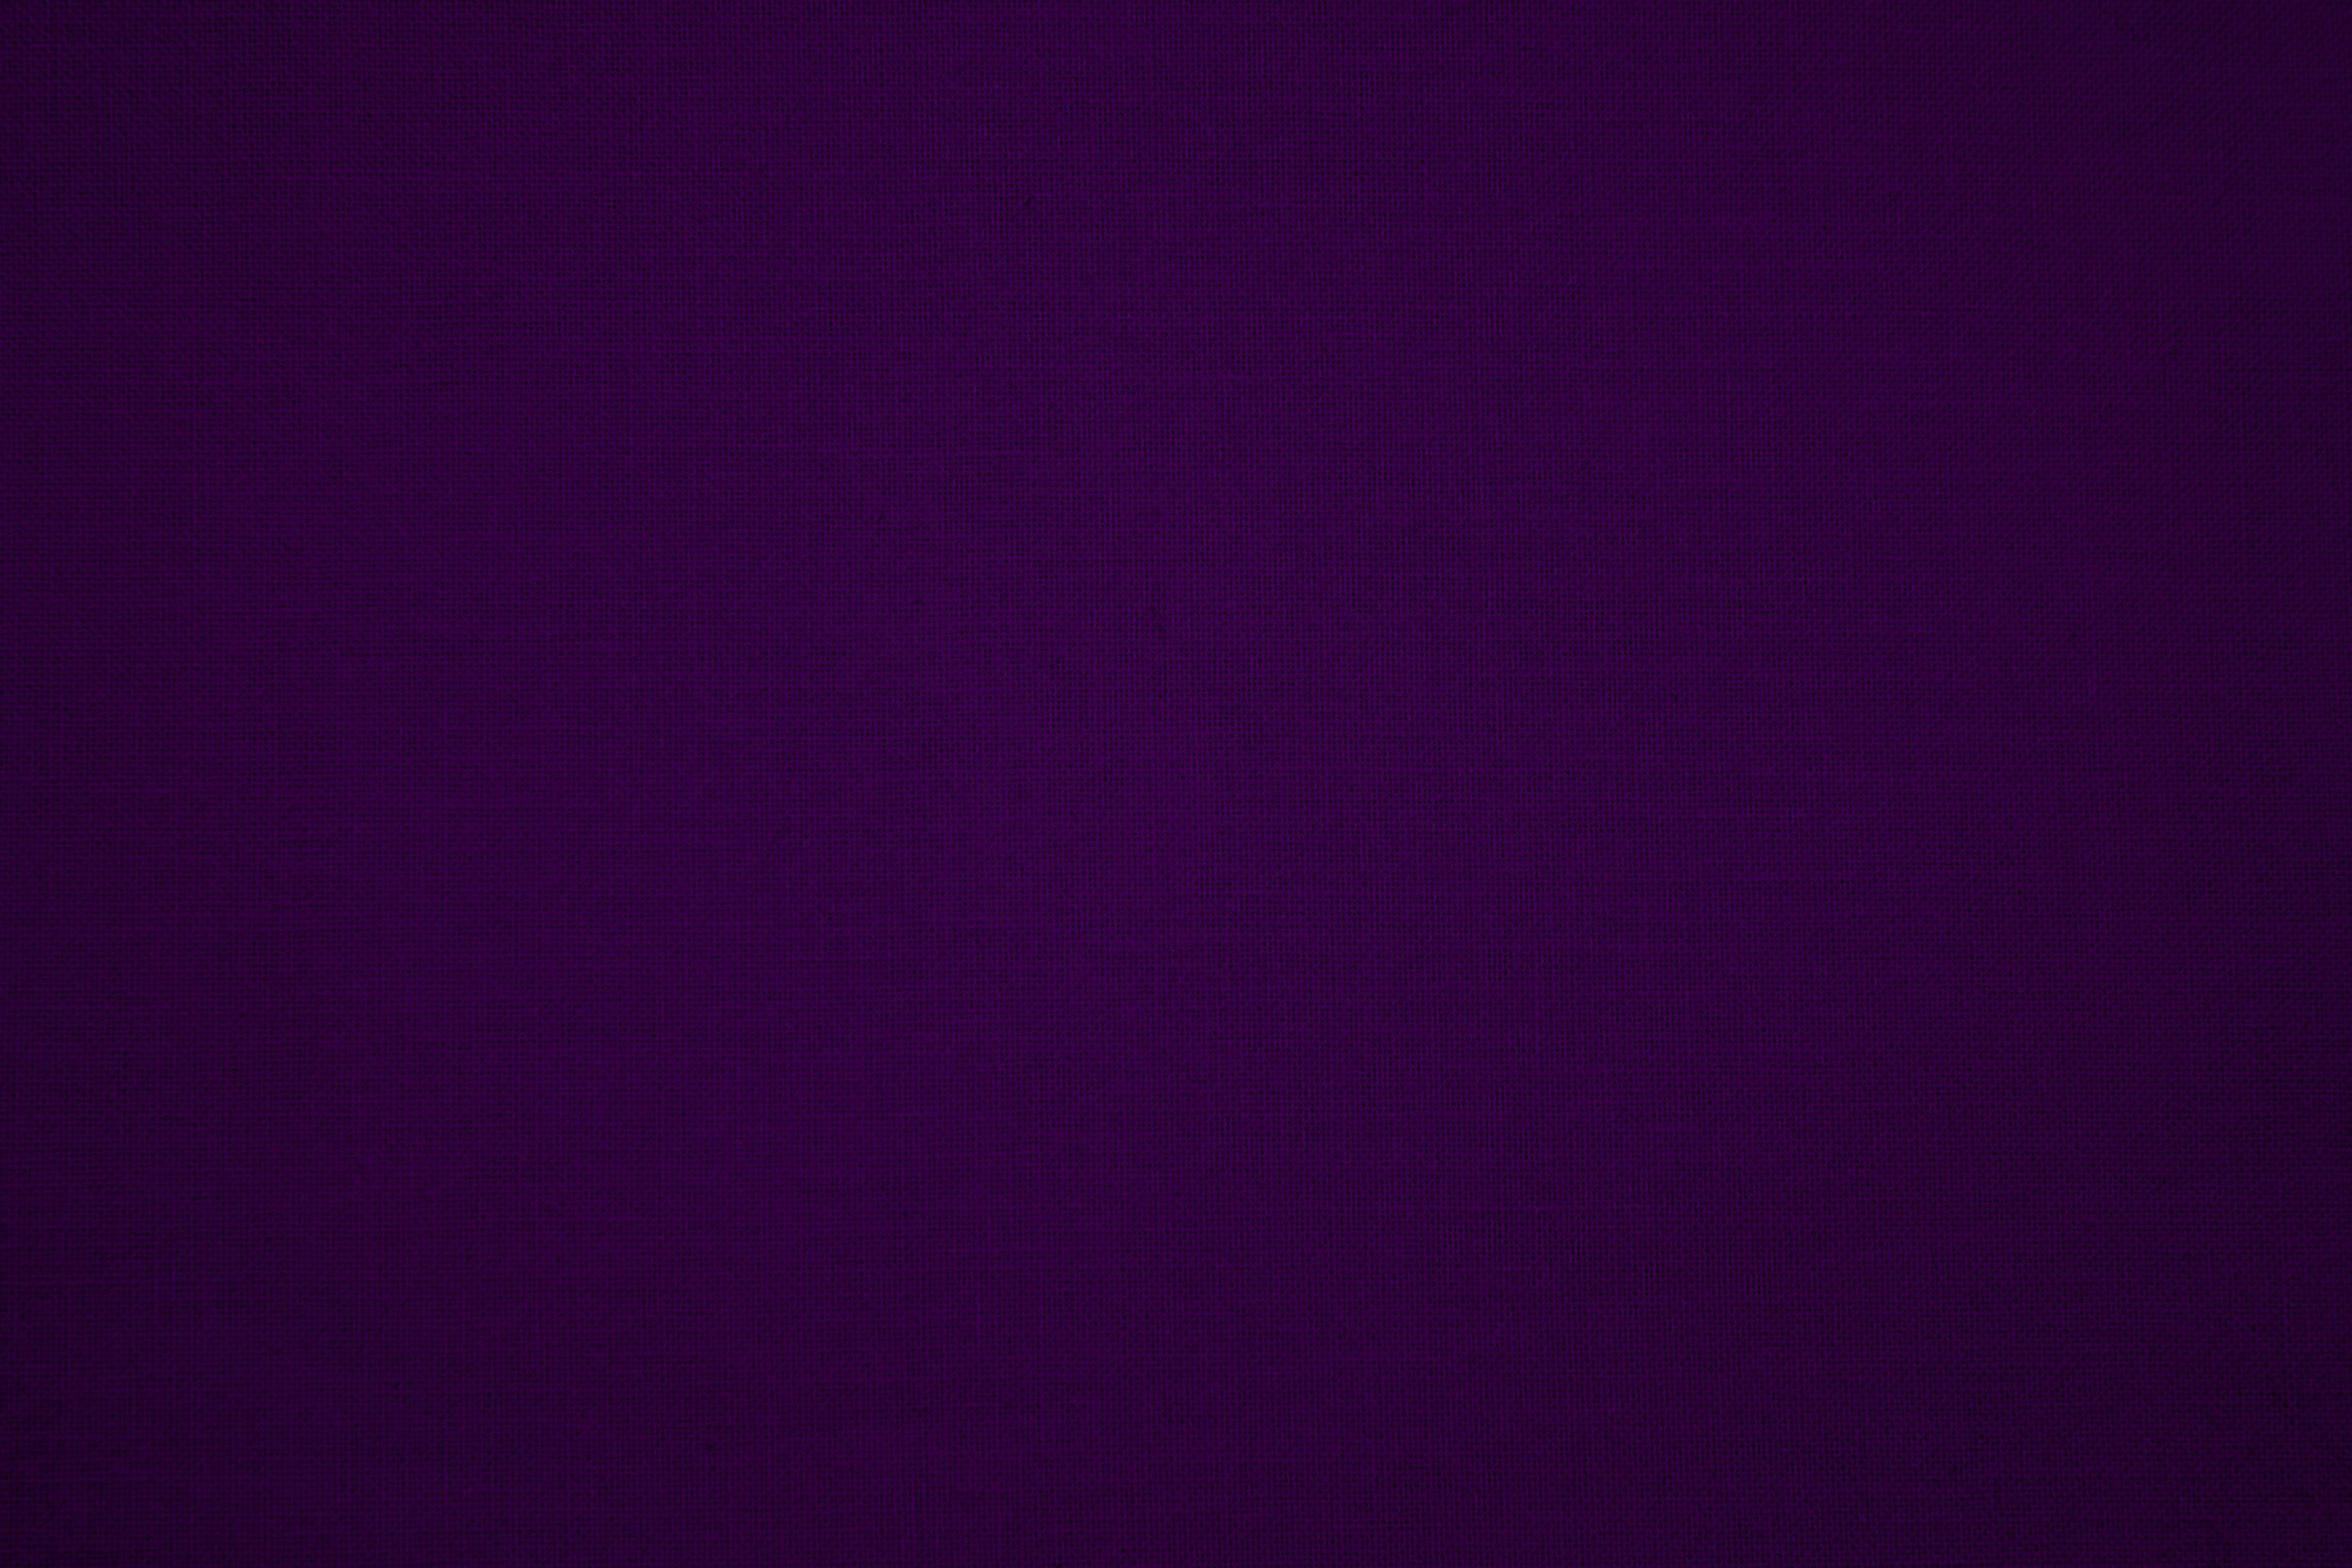 Dark Purple Backgrounds 3600x2400